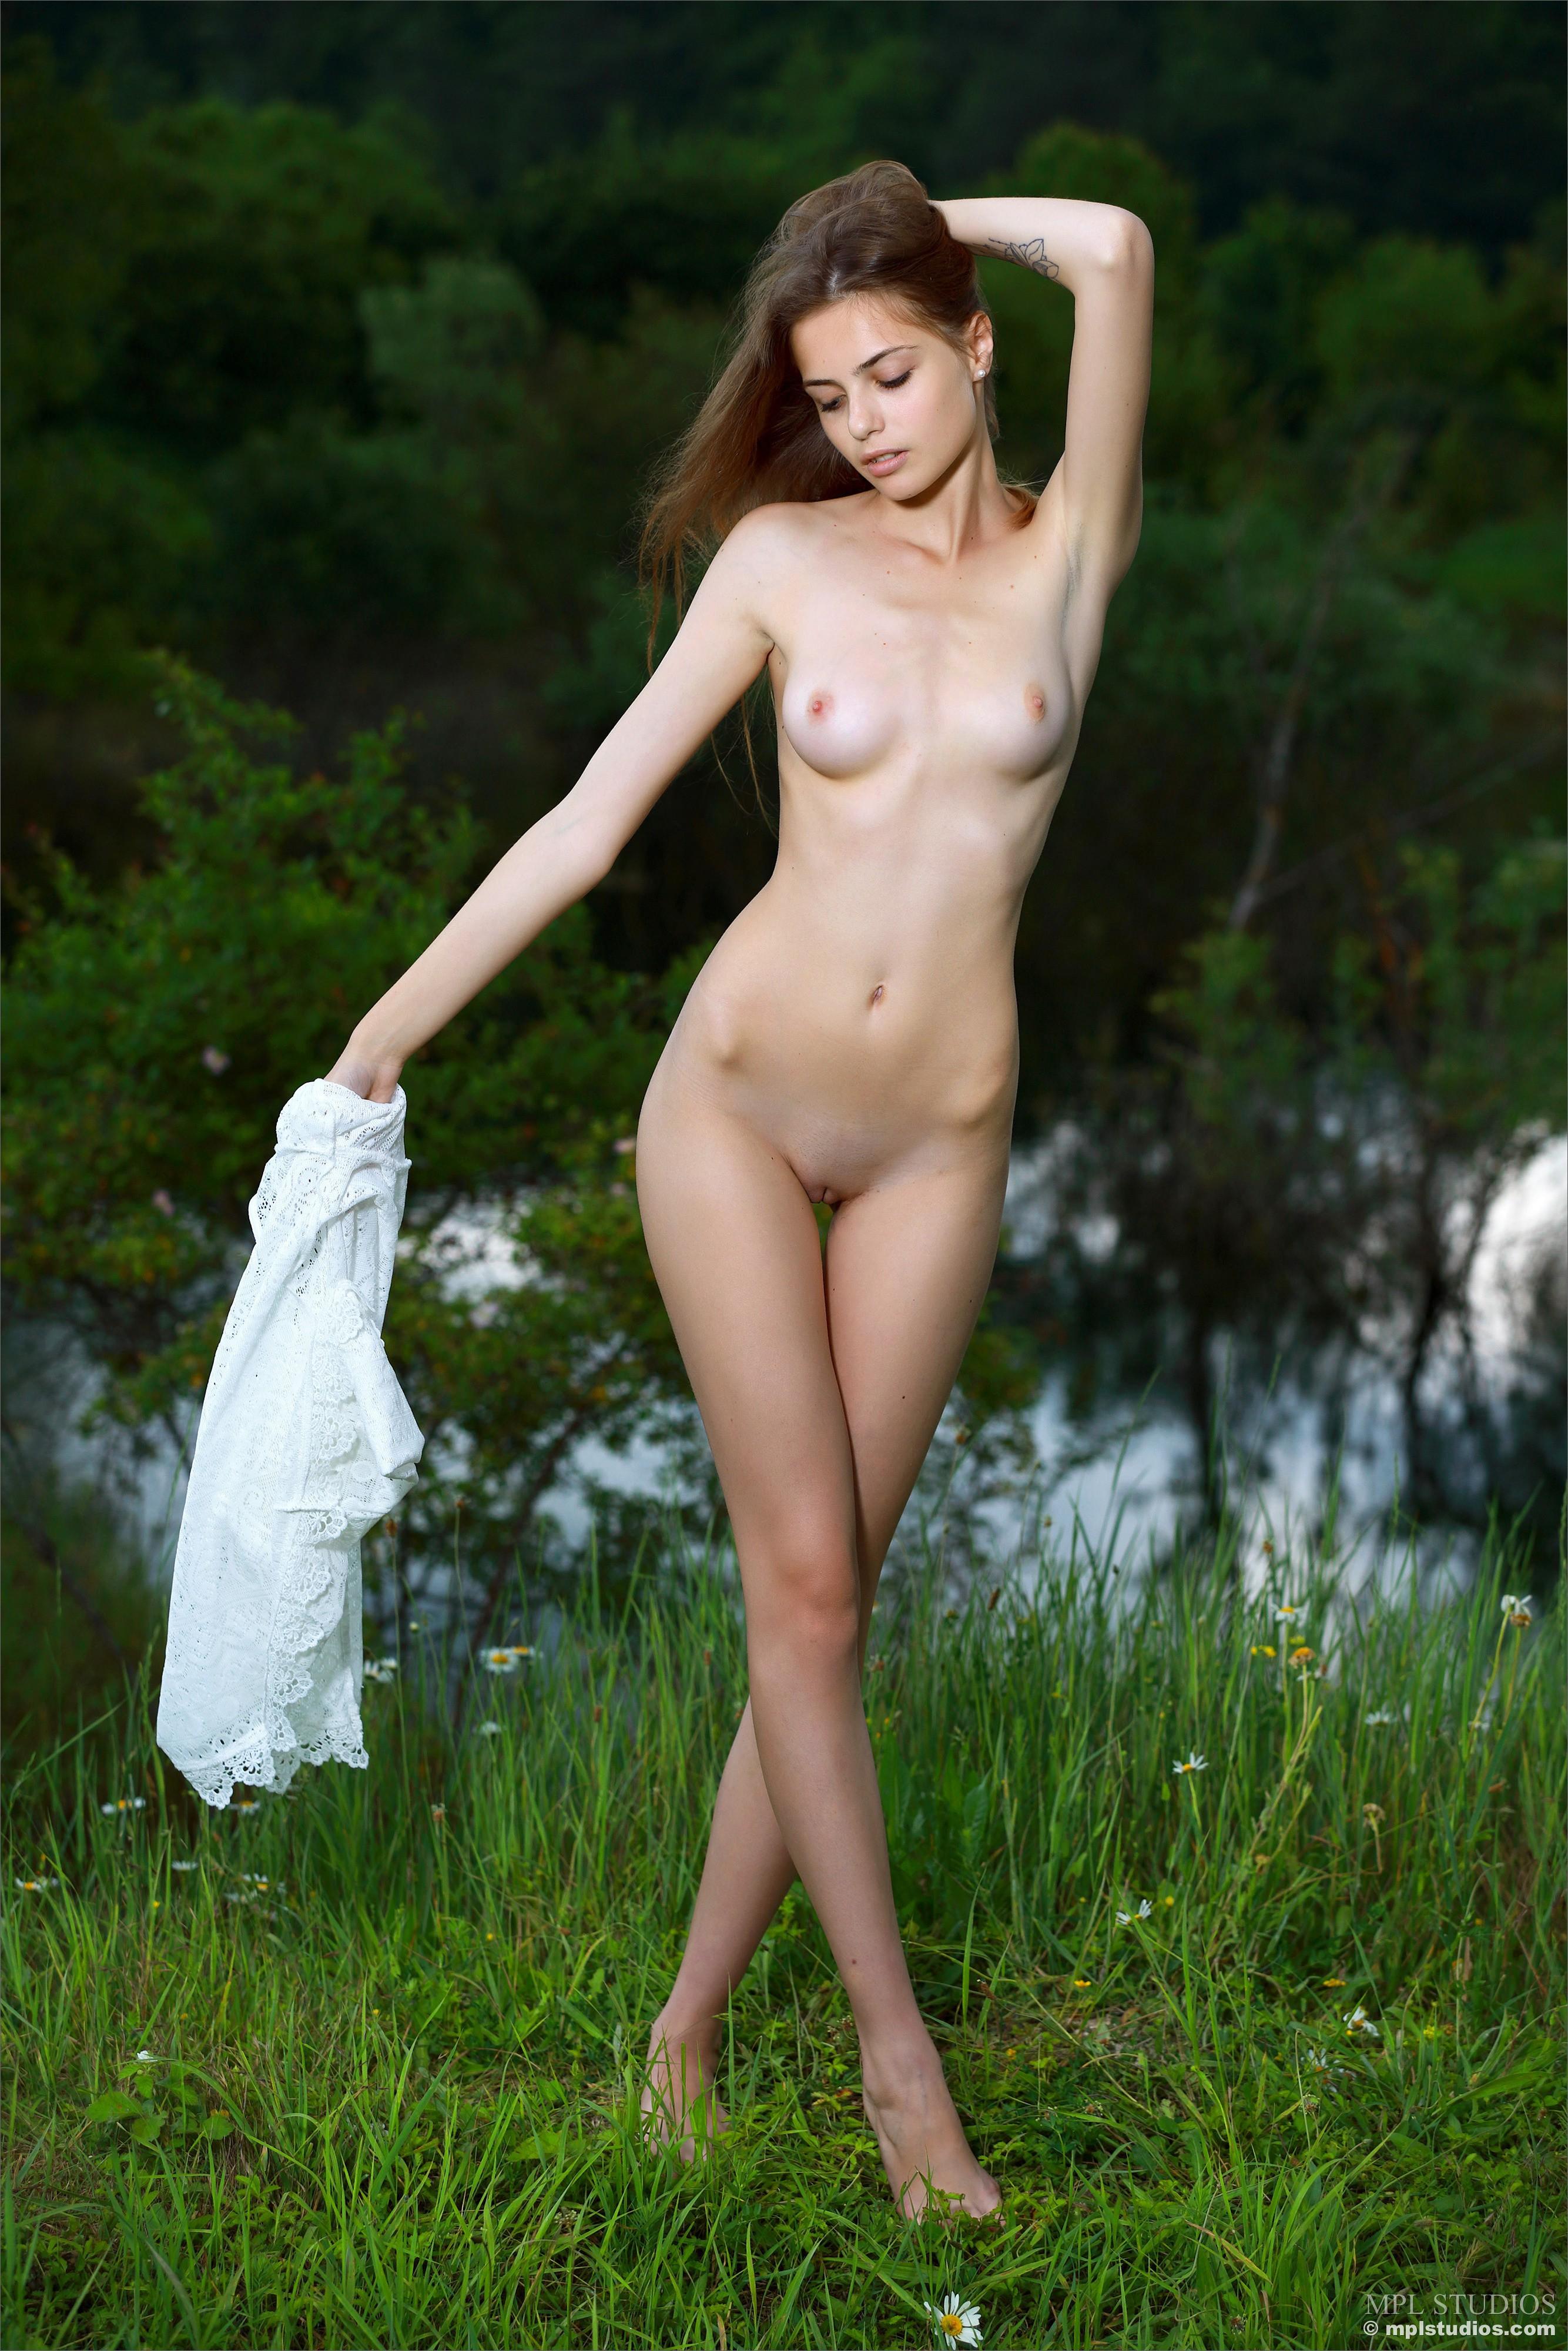 Фото вьетнамки голые на природе — 7